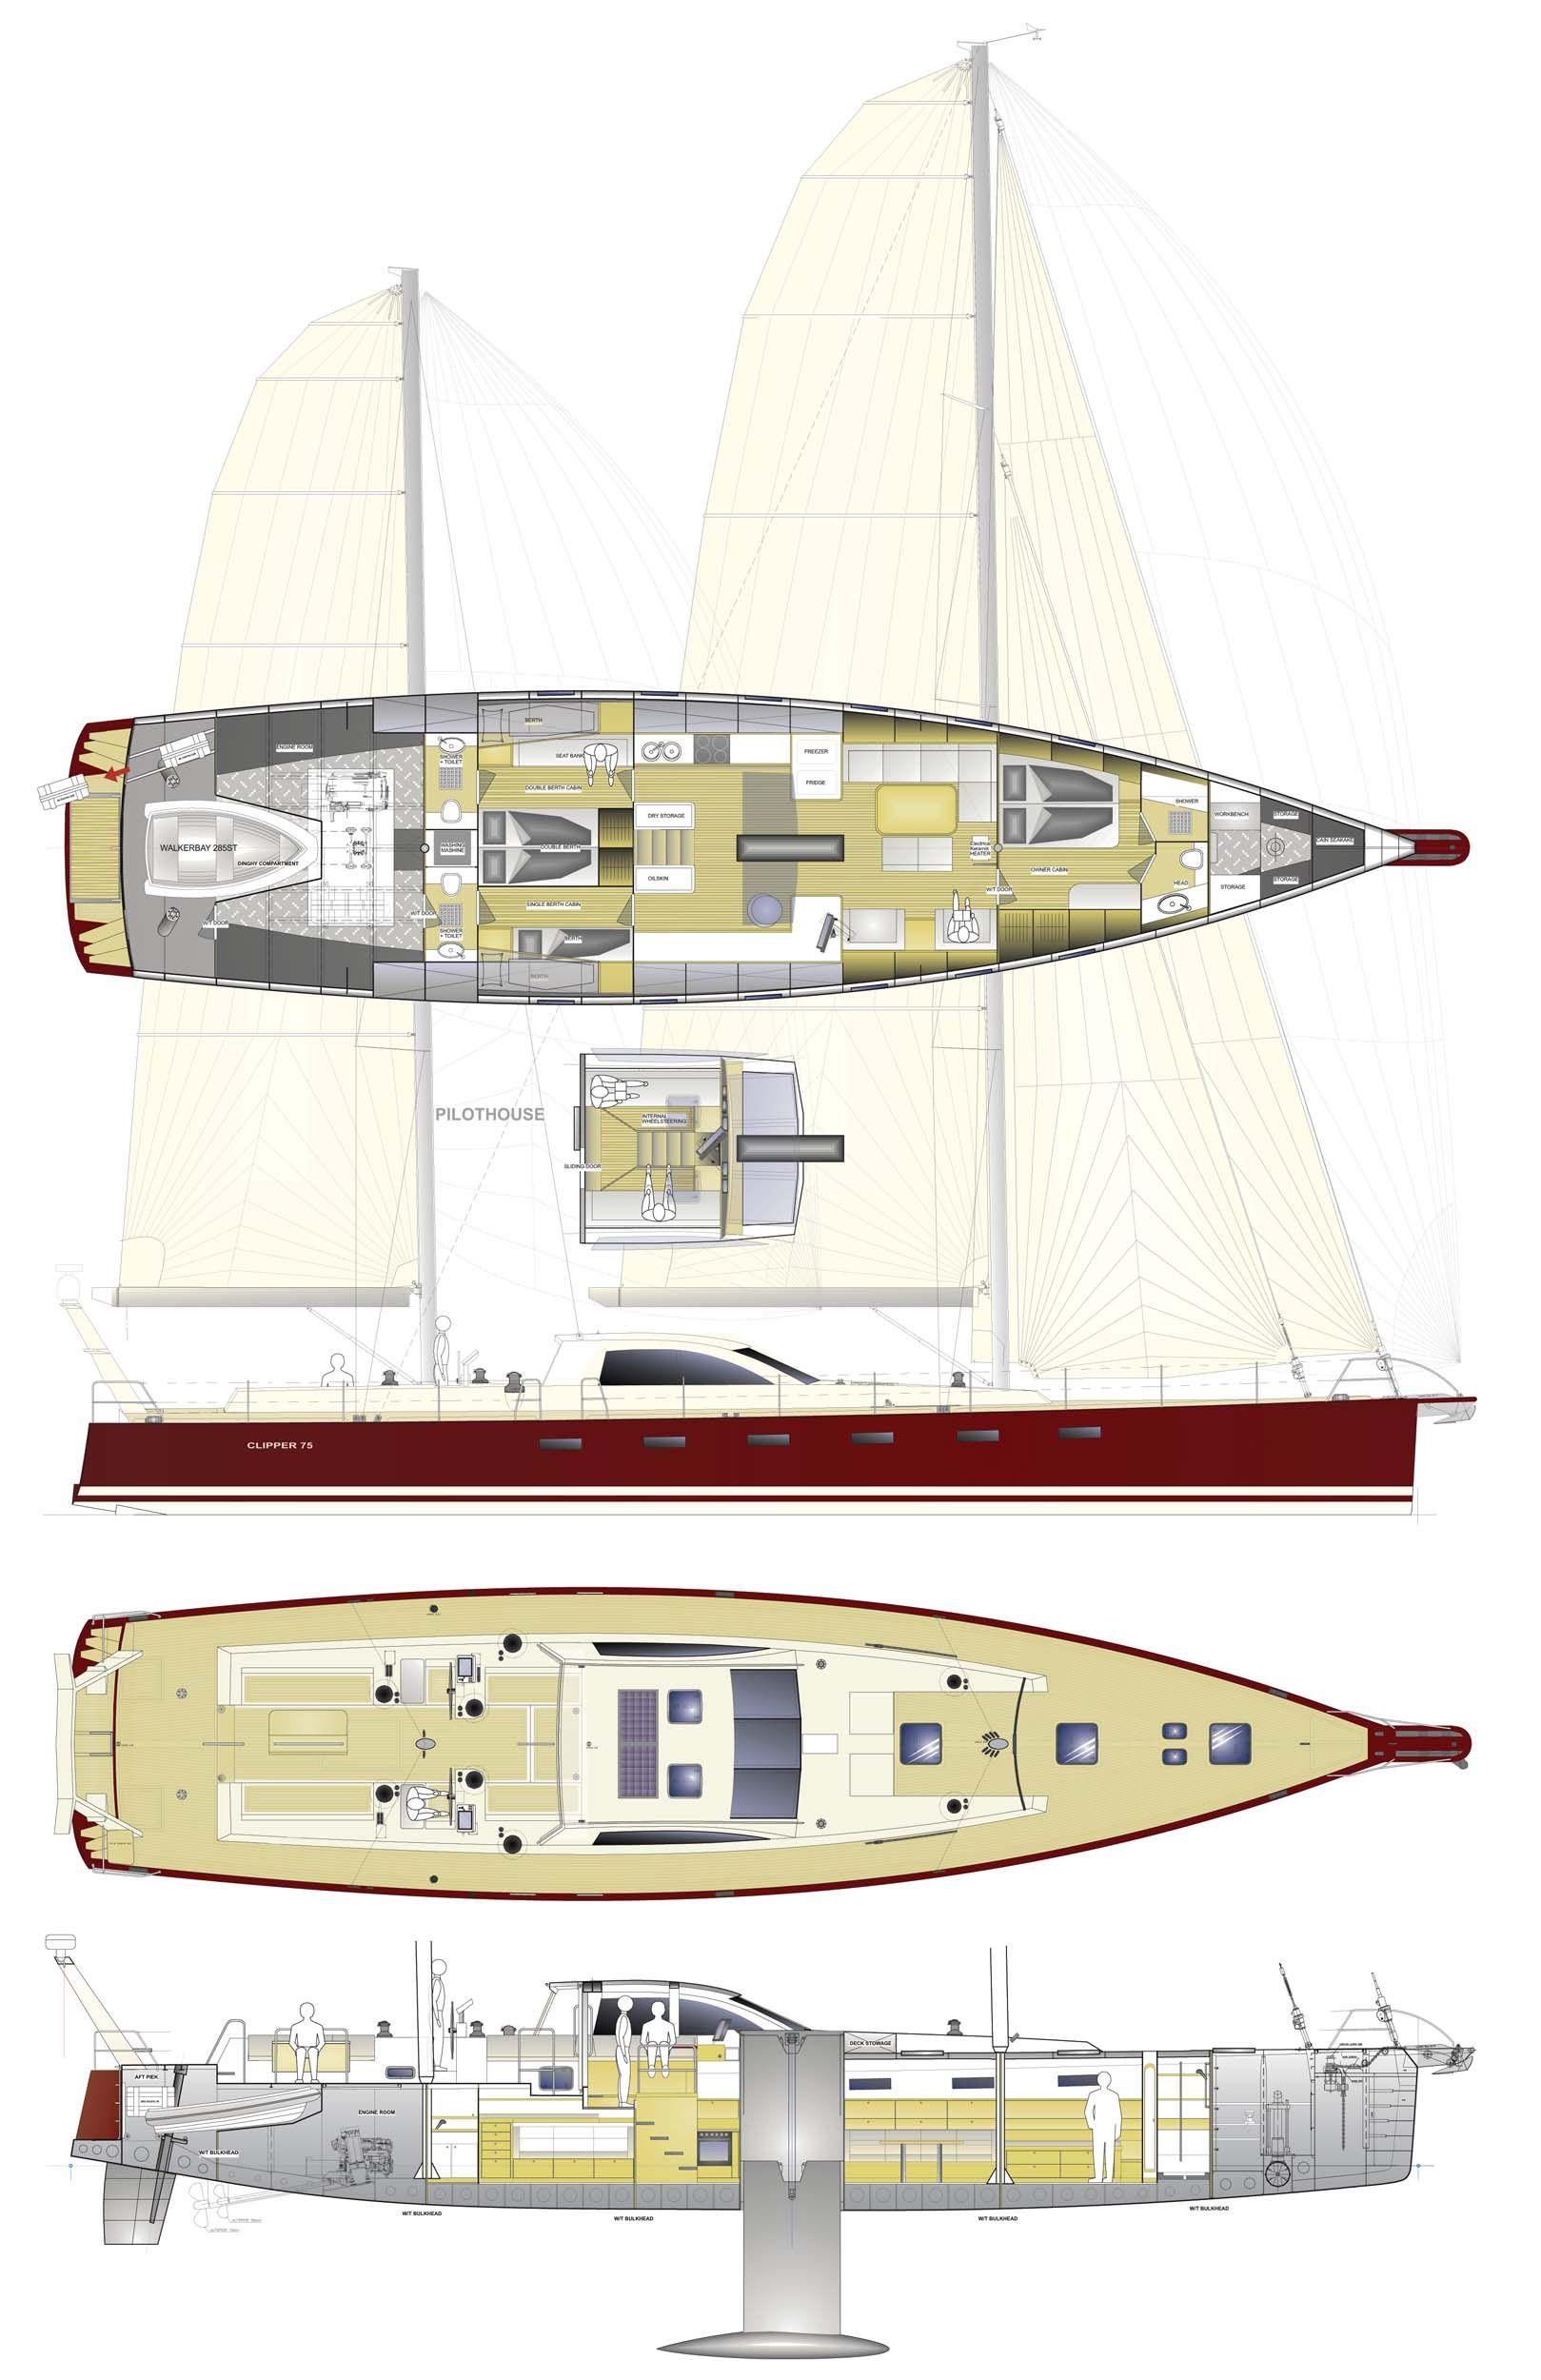 Conrad 115 Lunar. Sailing Yacht. | Yacht | Pinterest | Boating